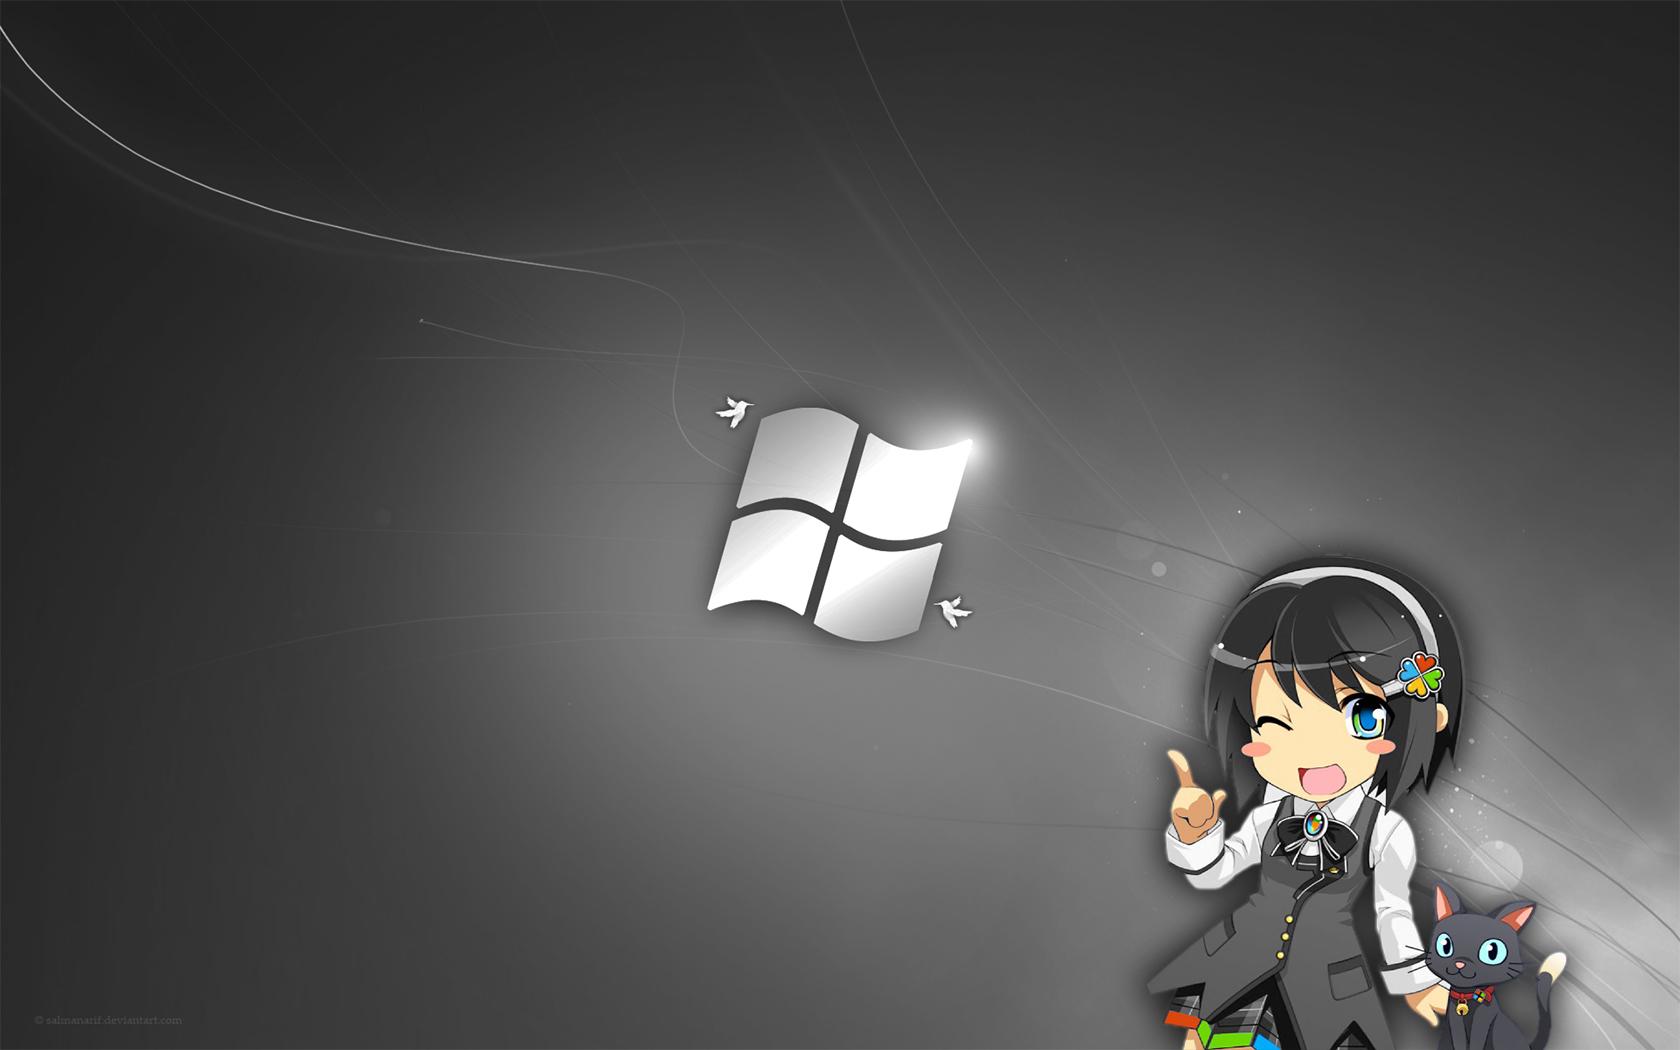 Anime wallpaper for windows 8 wallpapersafari - Anime computer wallpaper ...